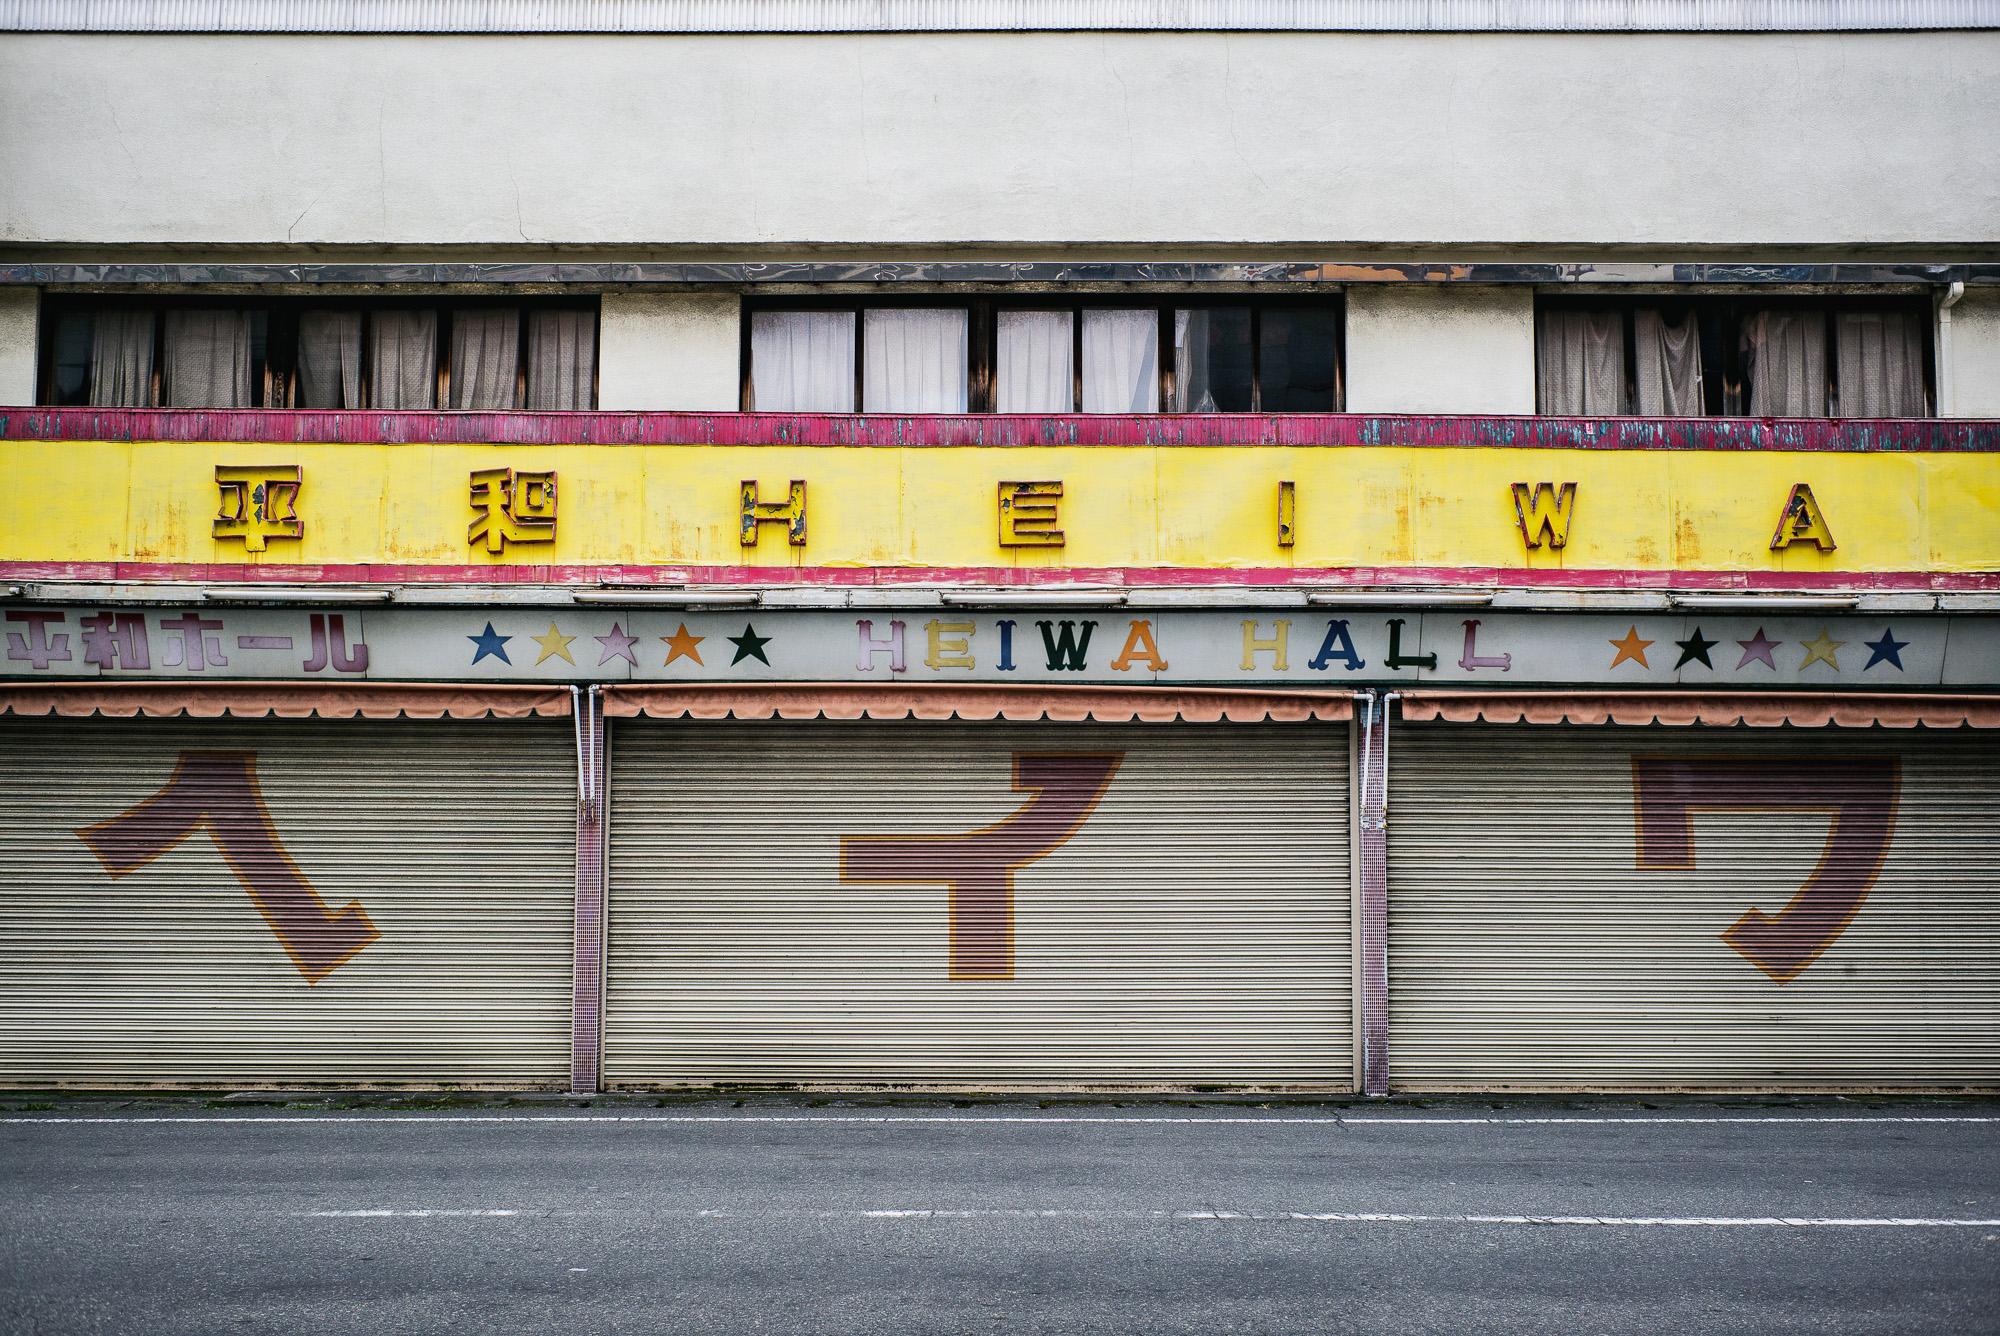 faded-japanese-city8-2000.jpg